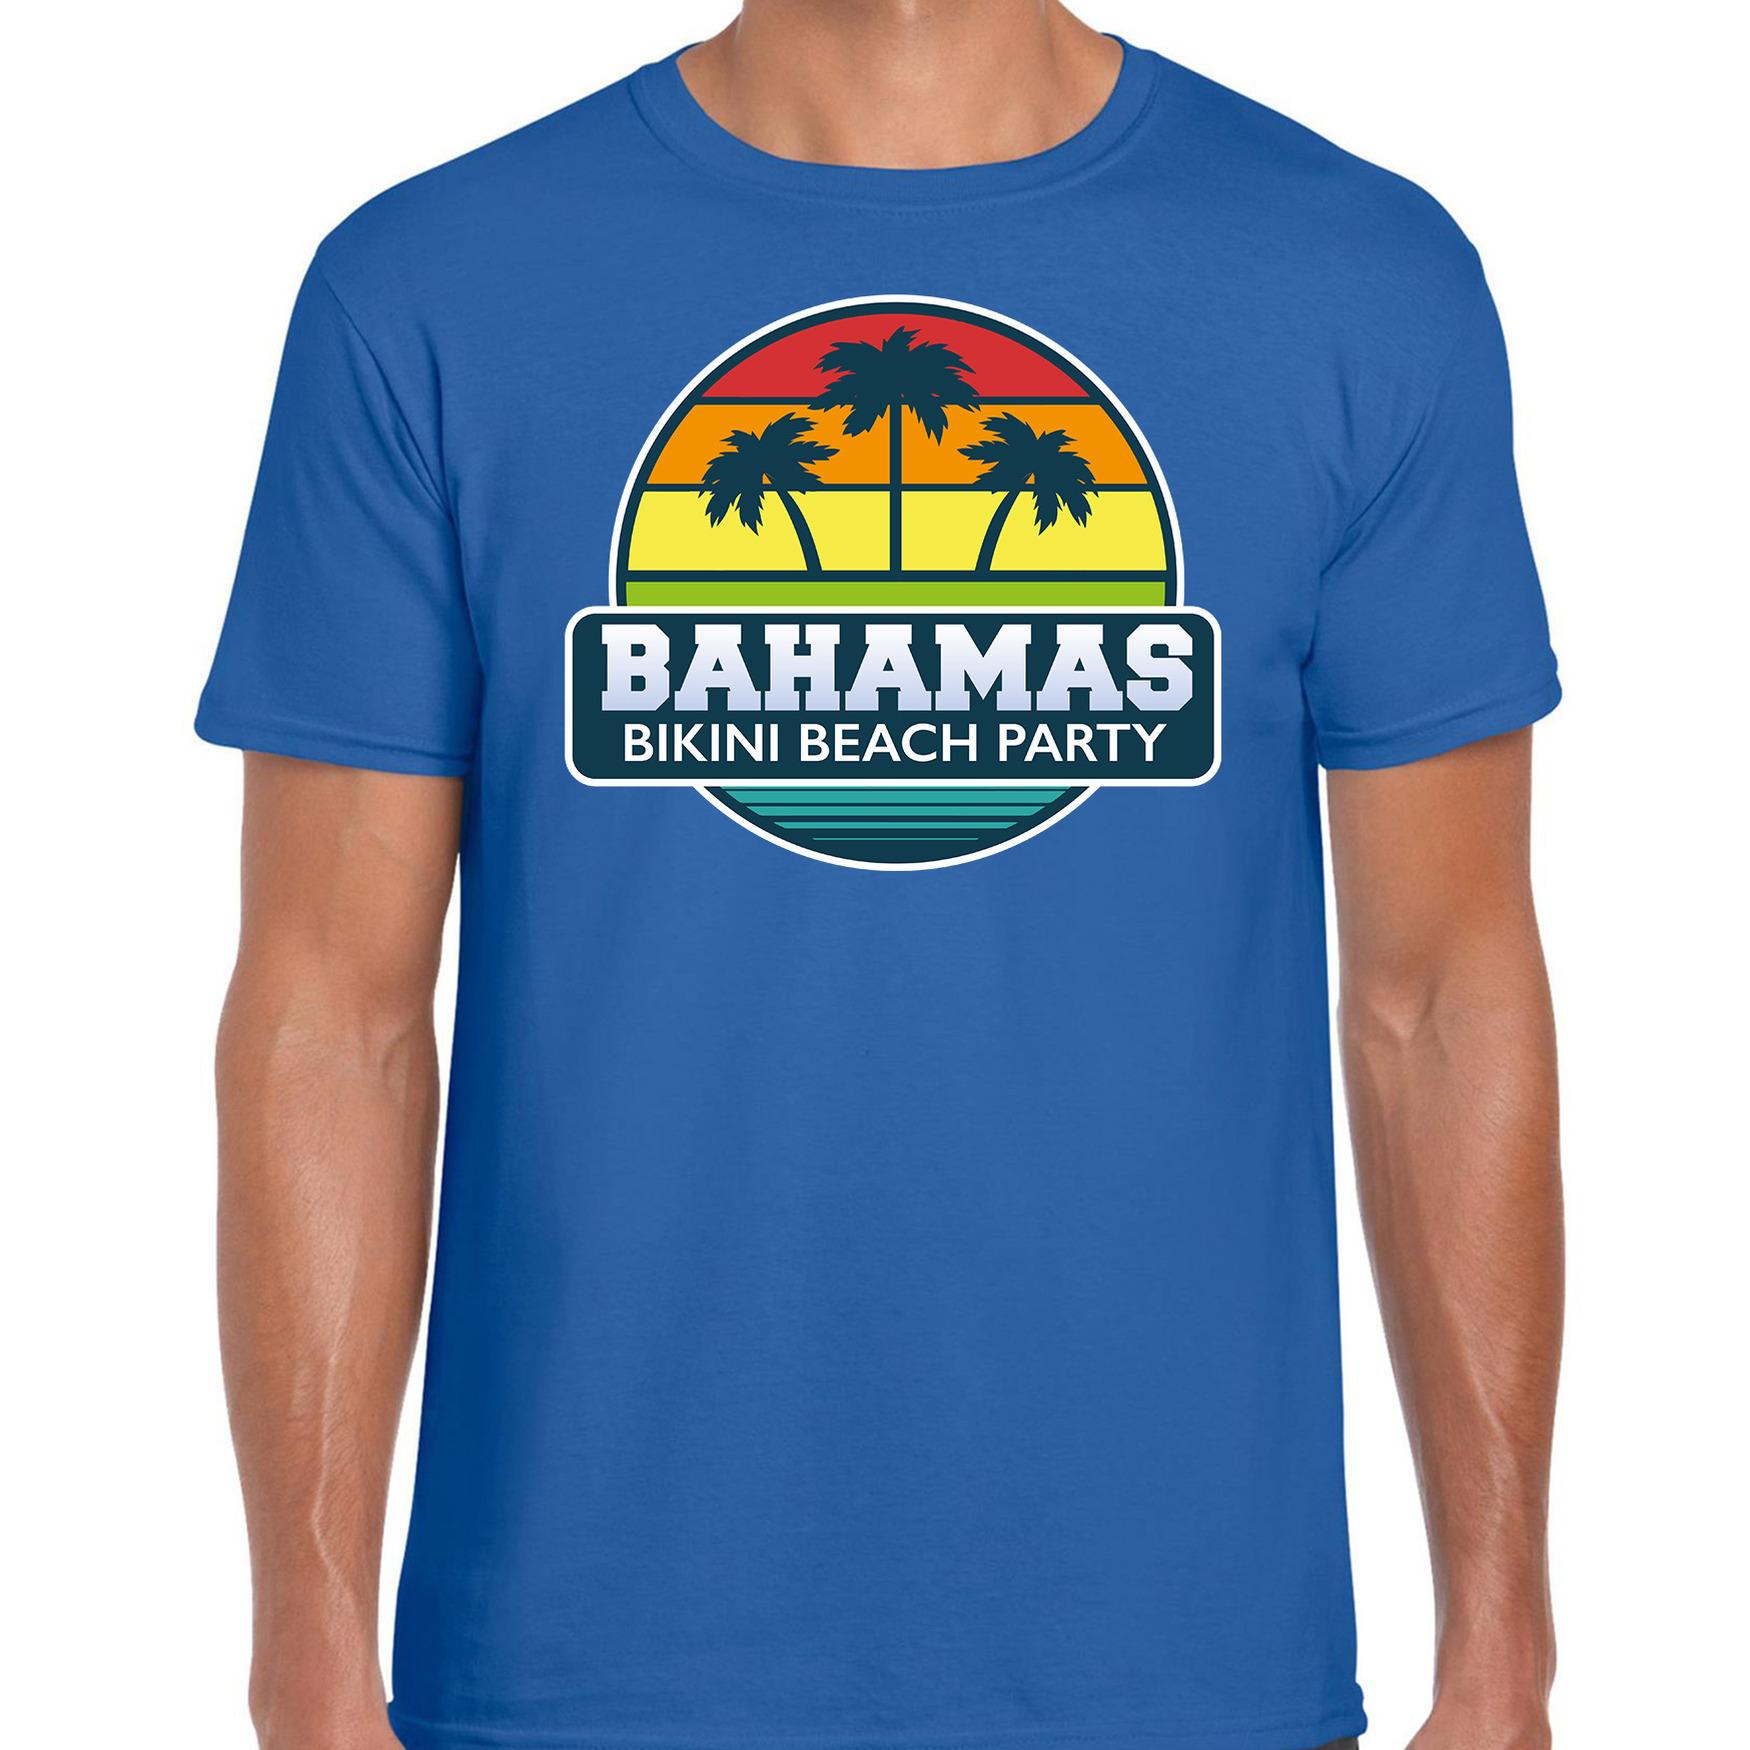 Bahamas zomer t-shirt / shirt Bahamas bikini beach party blauw voor heren